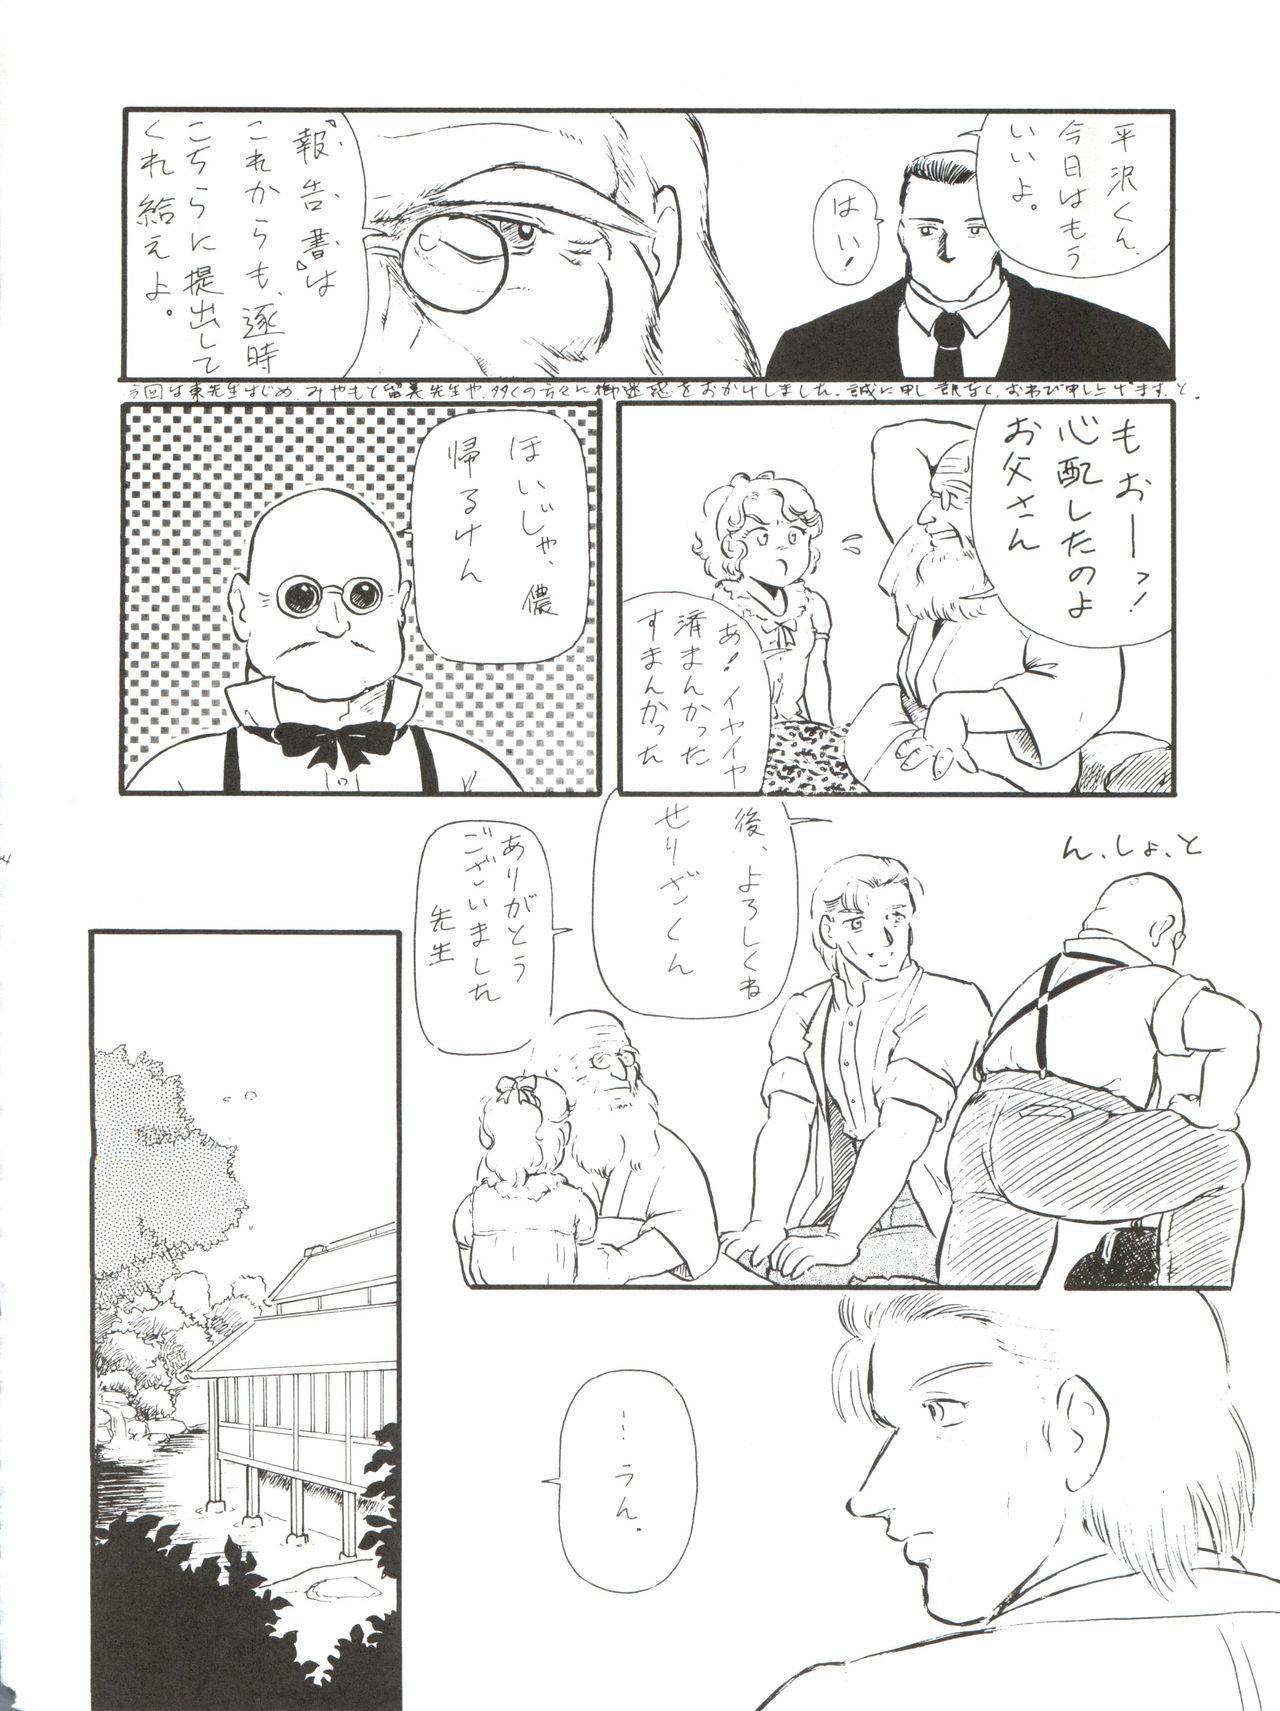 BLOOMAGAZINE Vol. 4 23